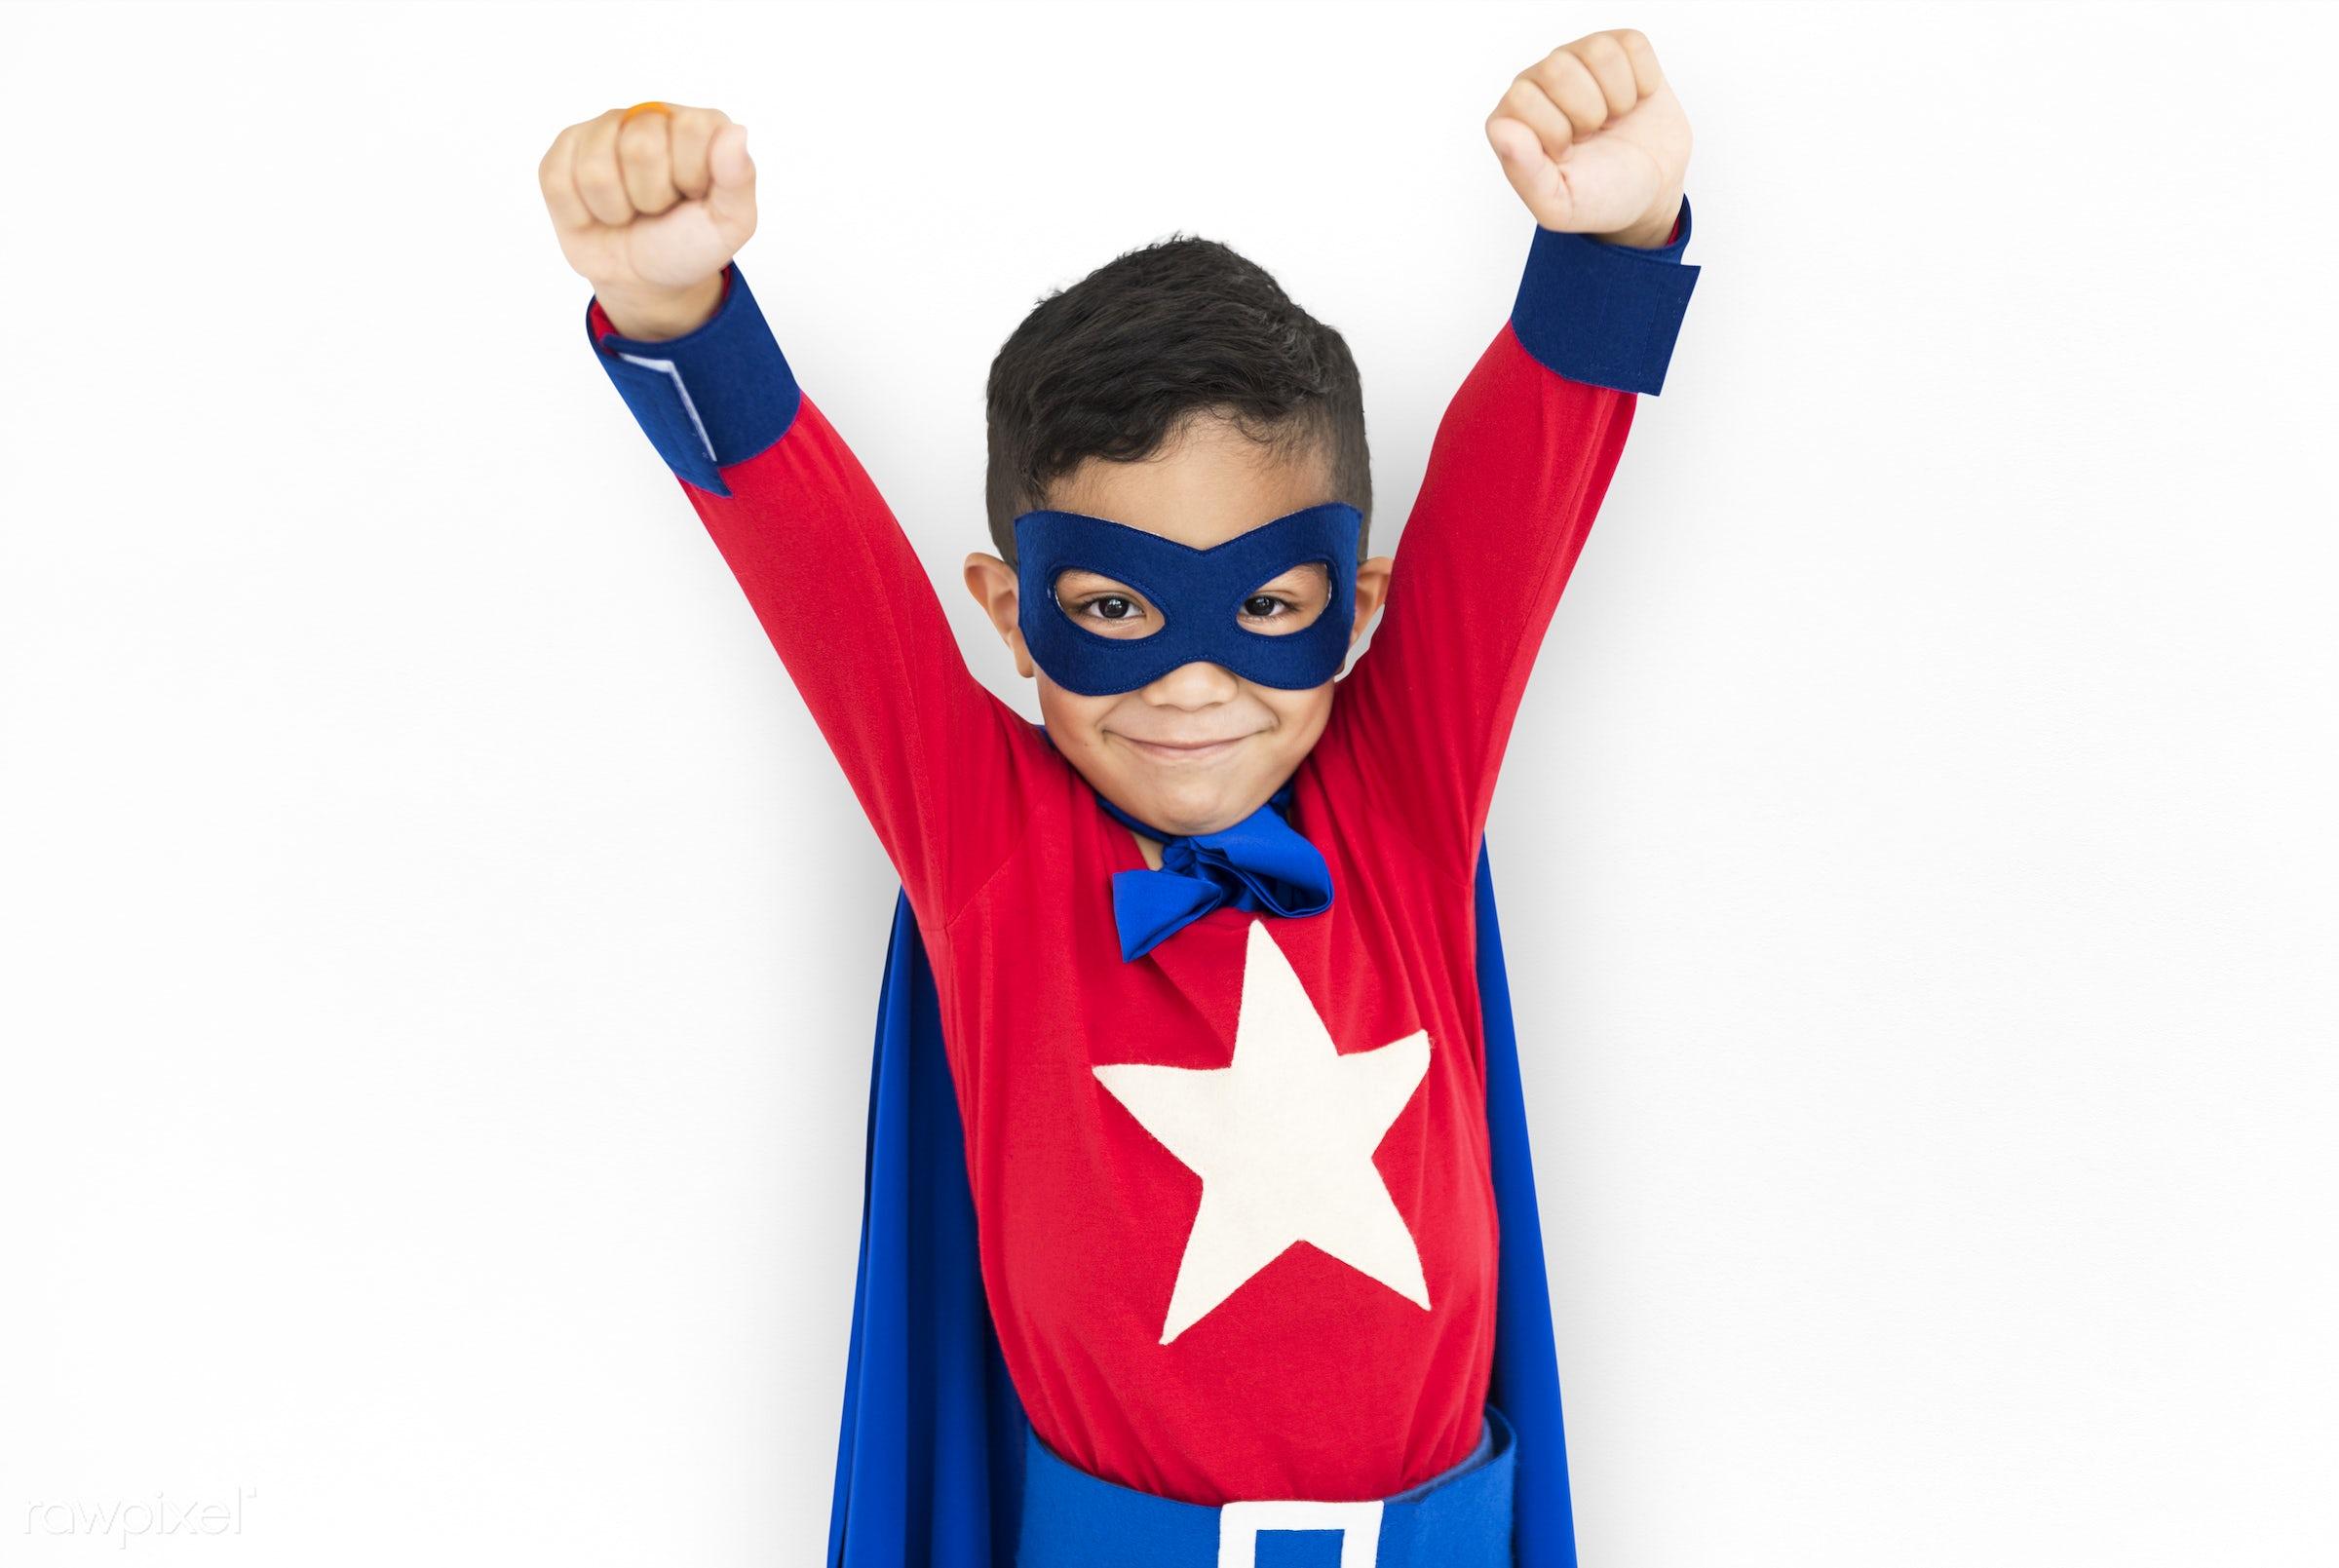 children, courageous, adolescence, kid, child, inspiration, leader, idol, childhood, superhero, isolated, hero, white,...